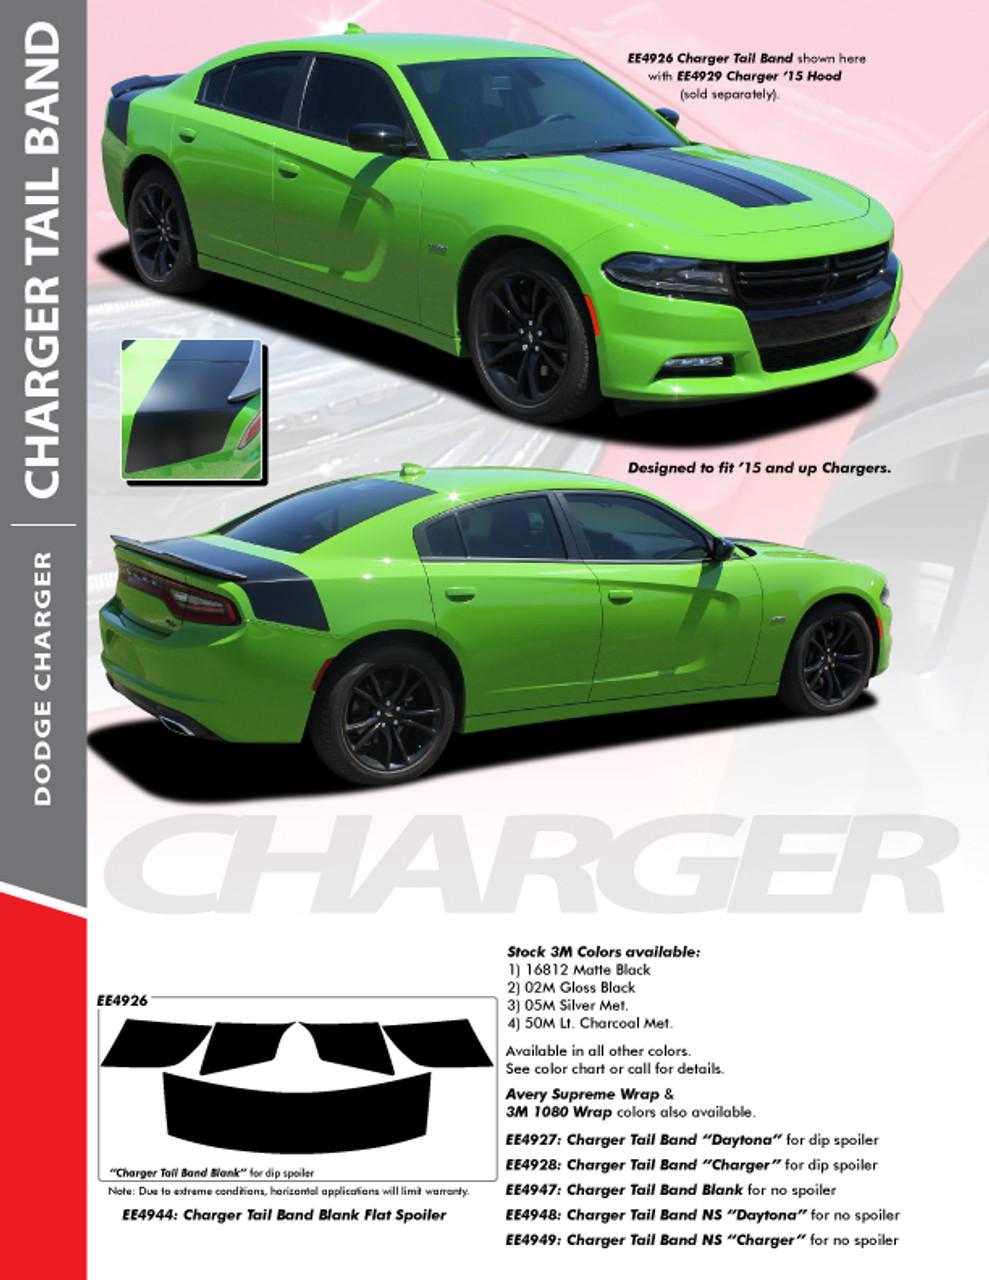 TAILBAND 15 : 2015-2018 Dodge Charger Hemi Daytona R/T SRT 392 Hellcat  Mopar Blackout Style Rear Decklid Trunk Vinyl Graphics Decals Kit